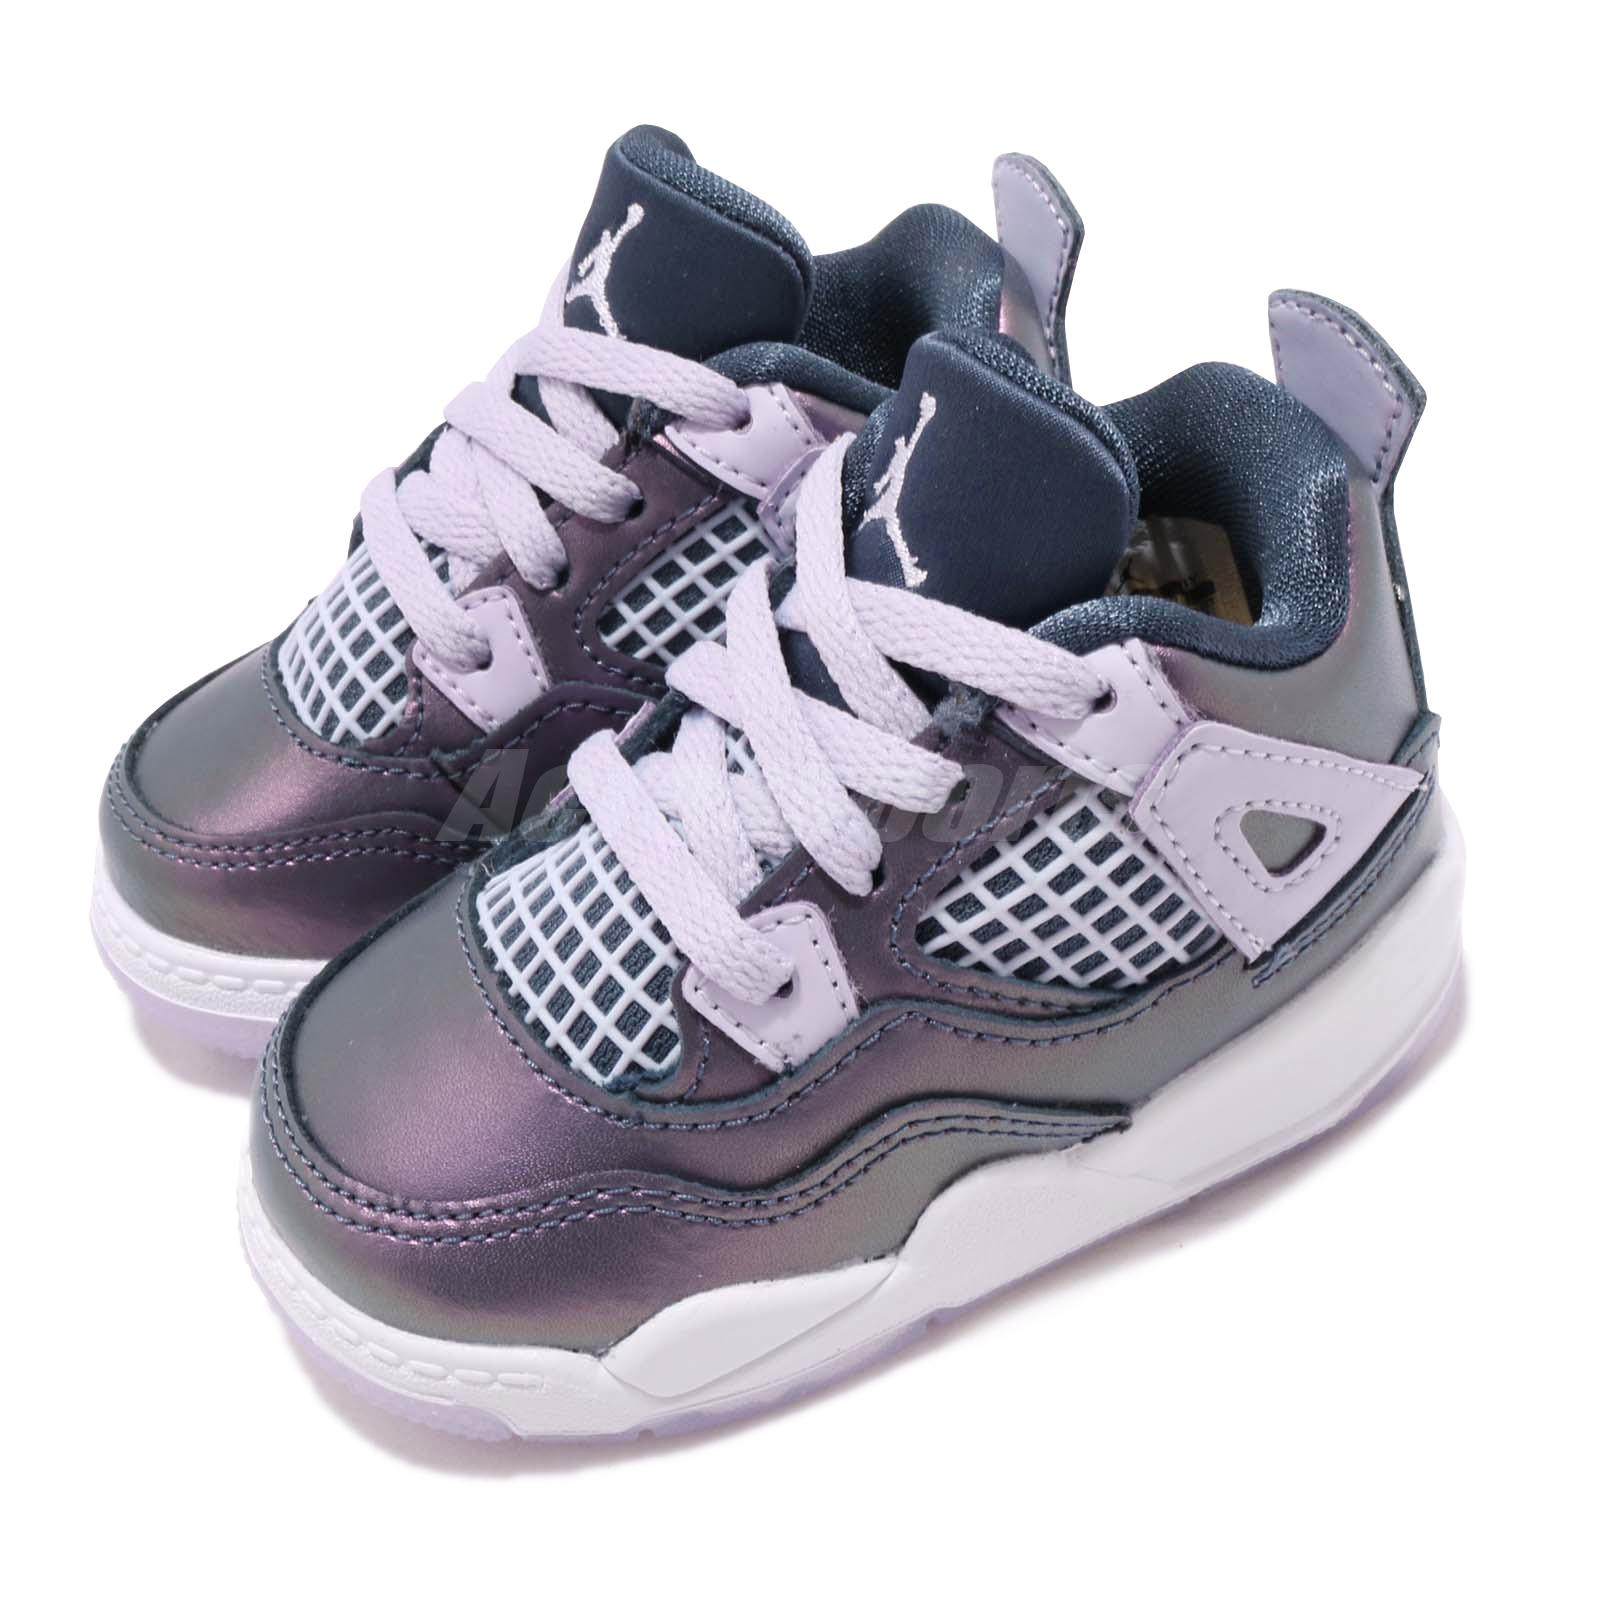 sports shoes 5f85e 68e7f Details about Nike Jordan 4 Retro TD IV AJ4 Monsoon Blue White Toddler  Infant Shoes BQ9041-400